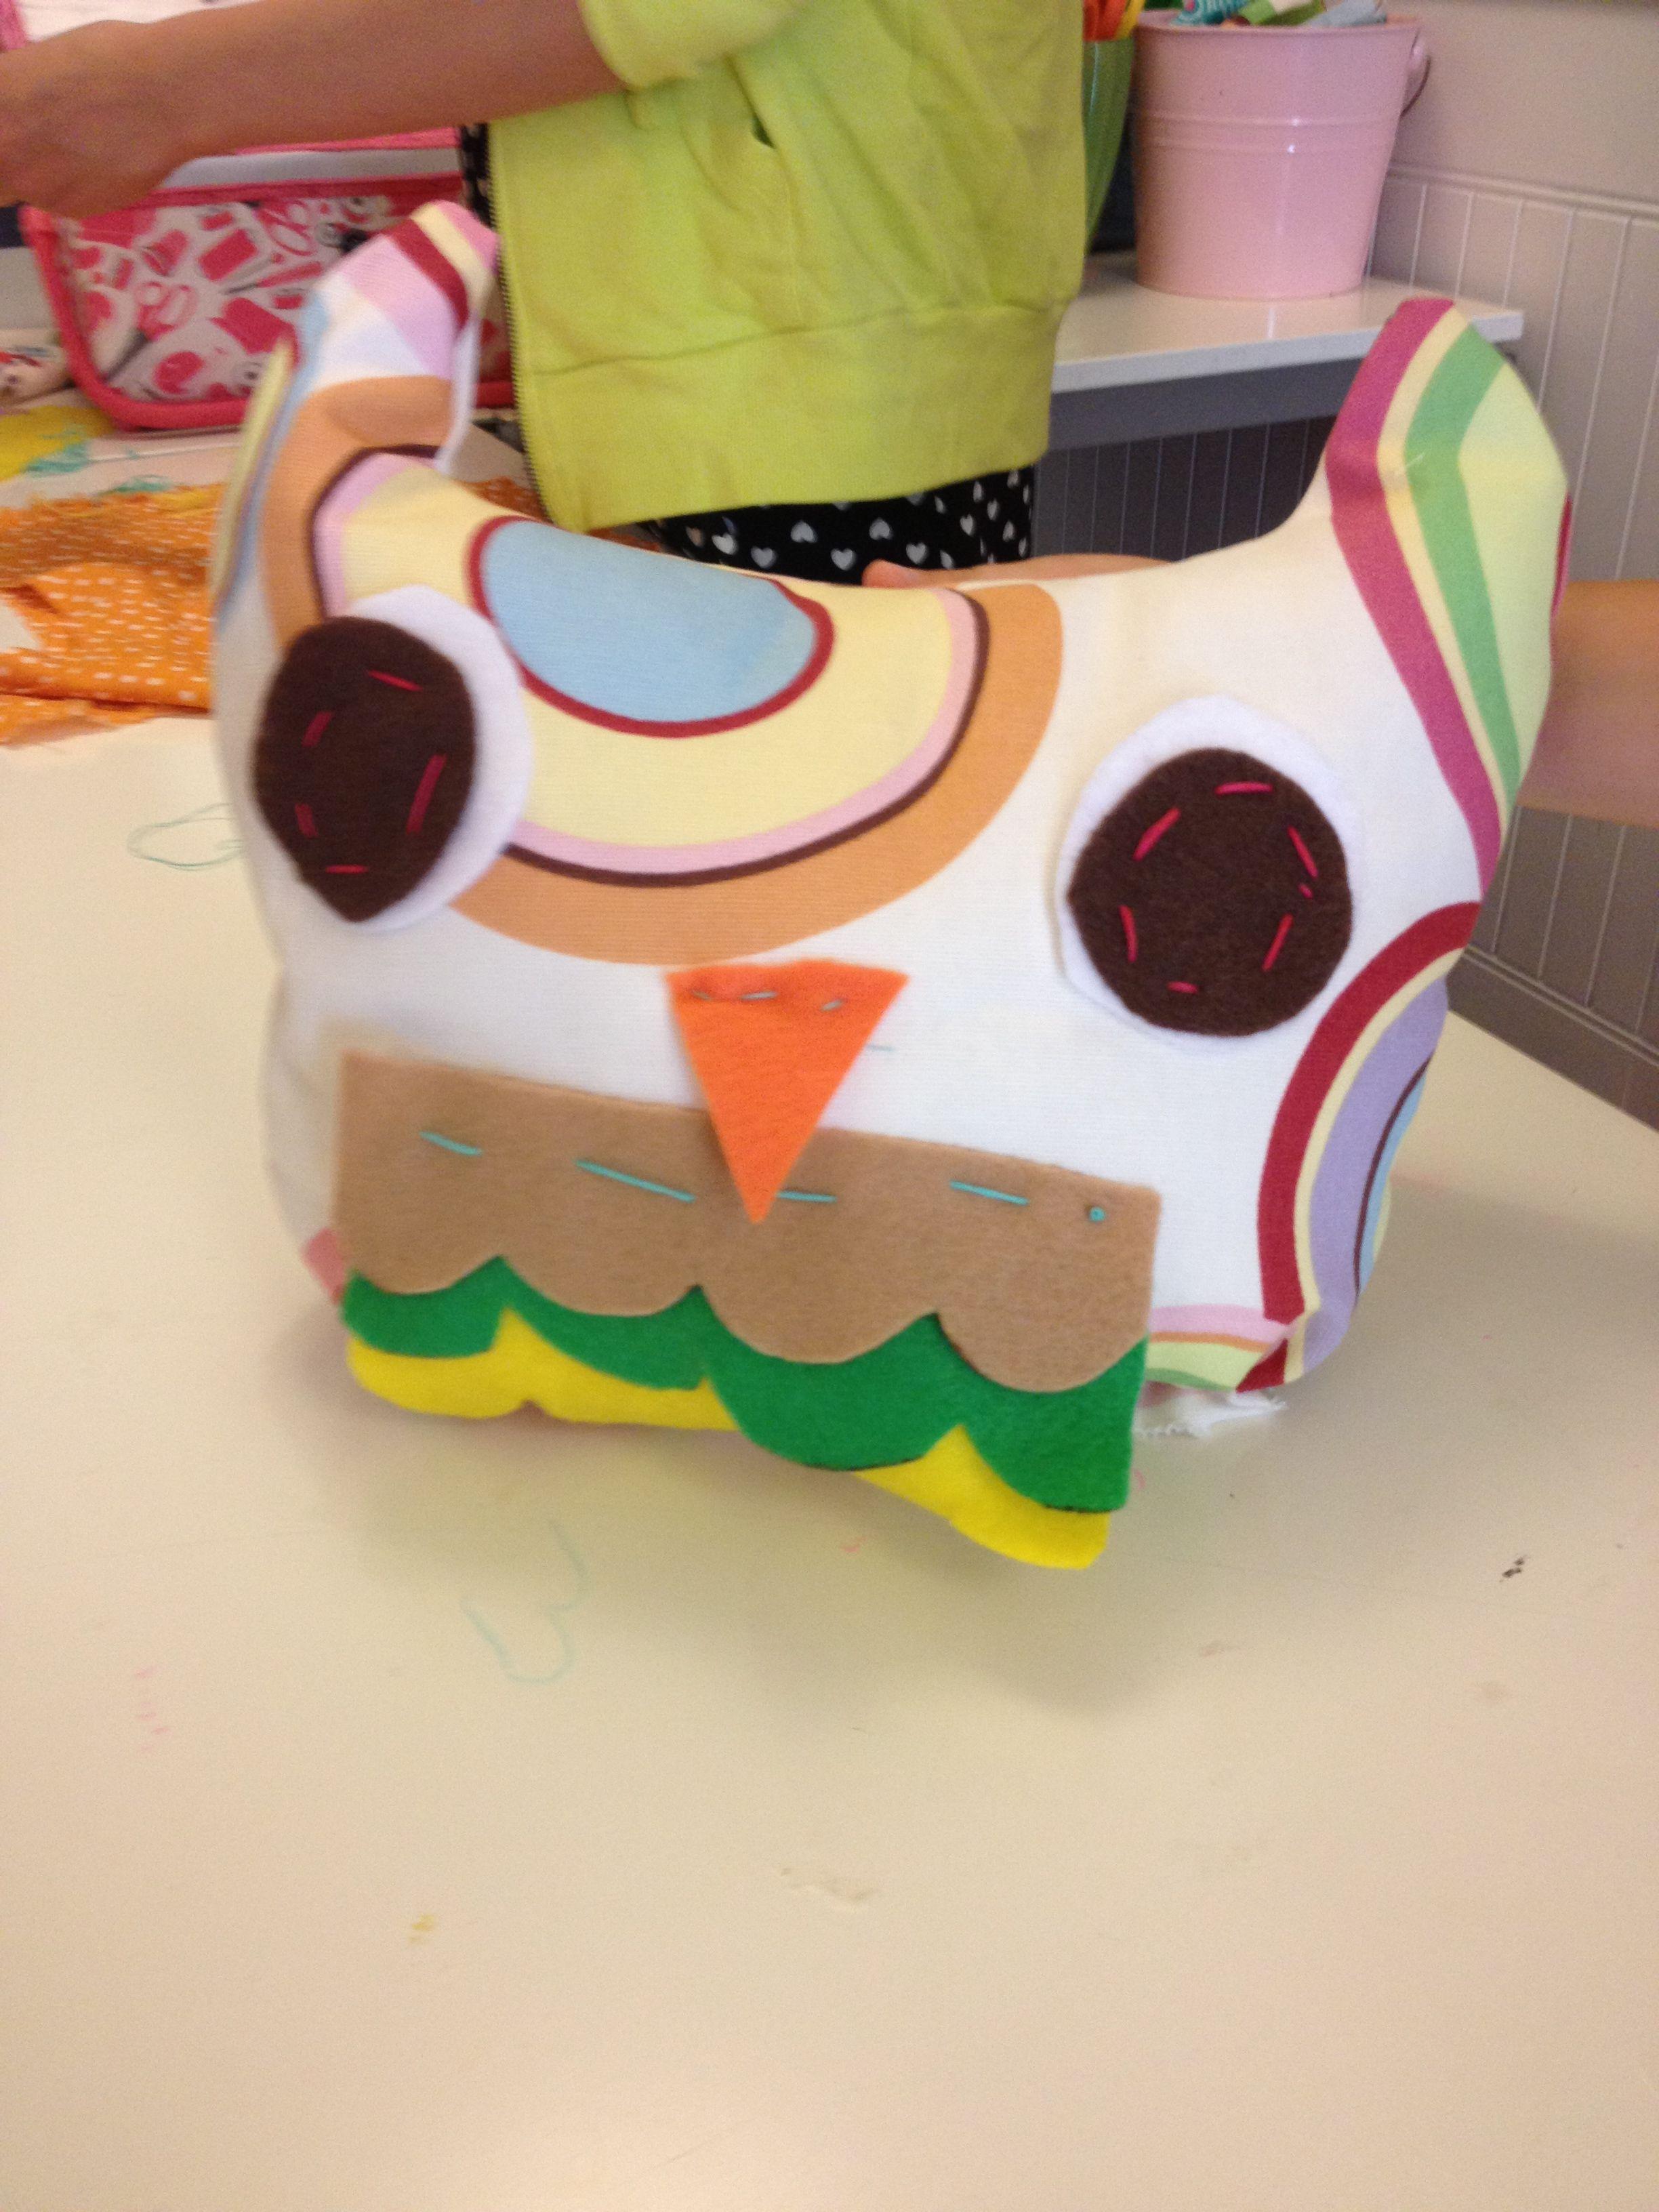 Fabric owl pillows done at Lollipop Art Lounge fabric Friday art camp. Www.lollipopartlounge.com